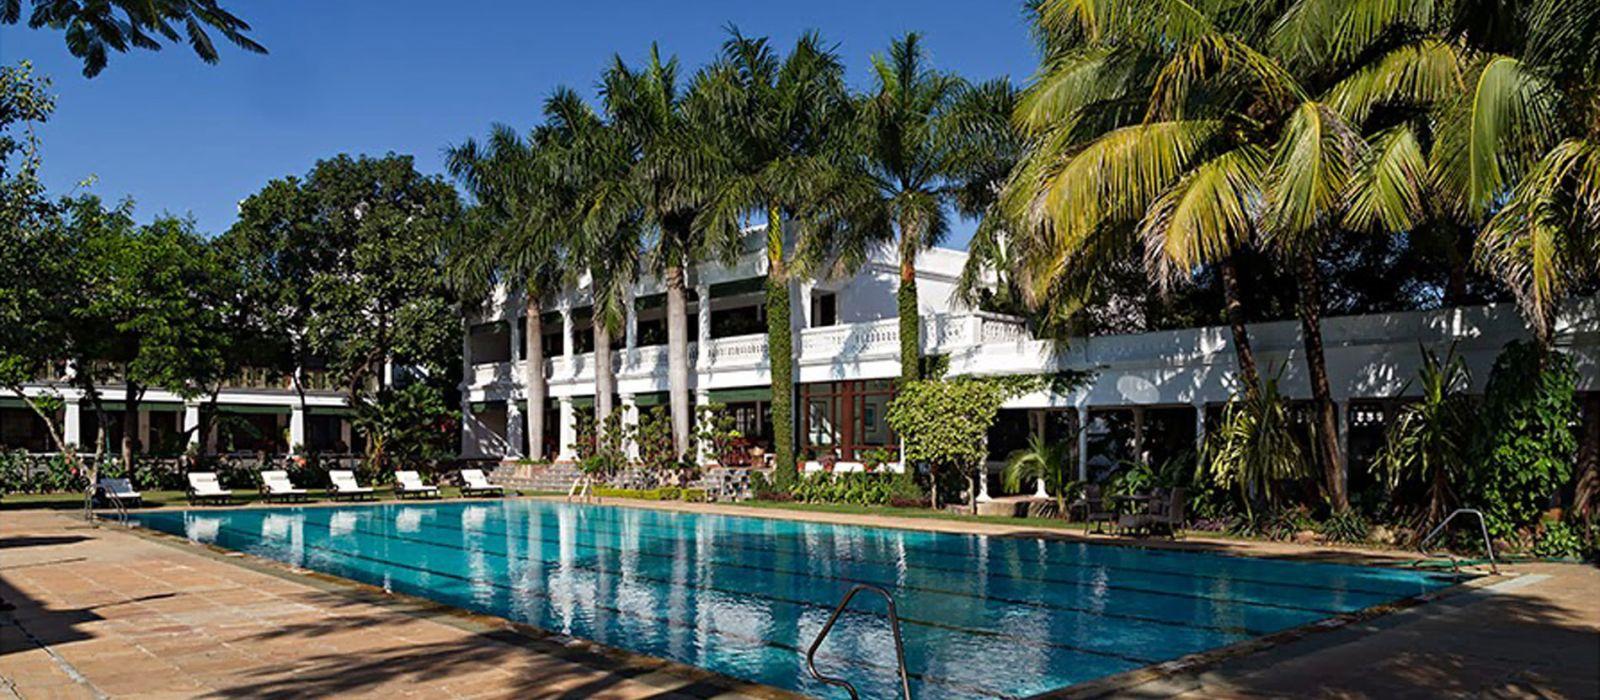 Hotel Jehan Numa Palace Zentral- & Westindien